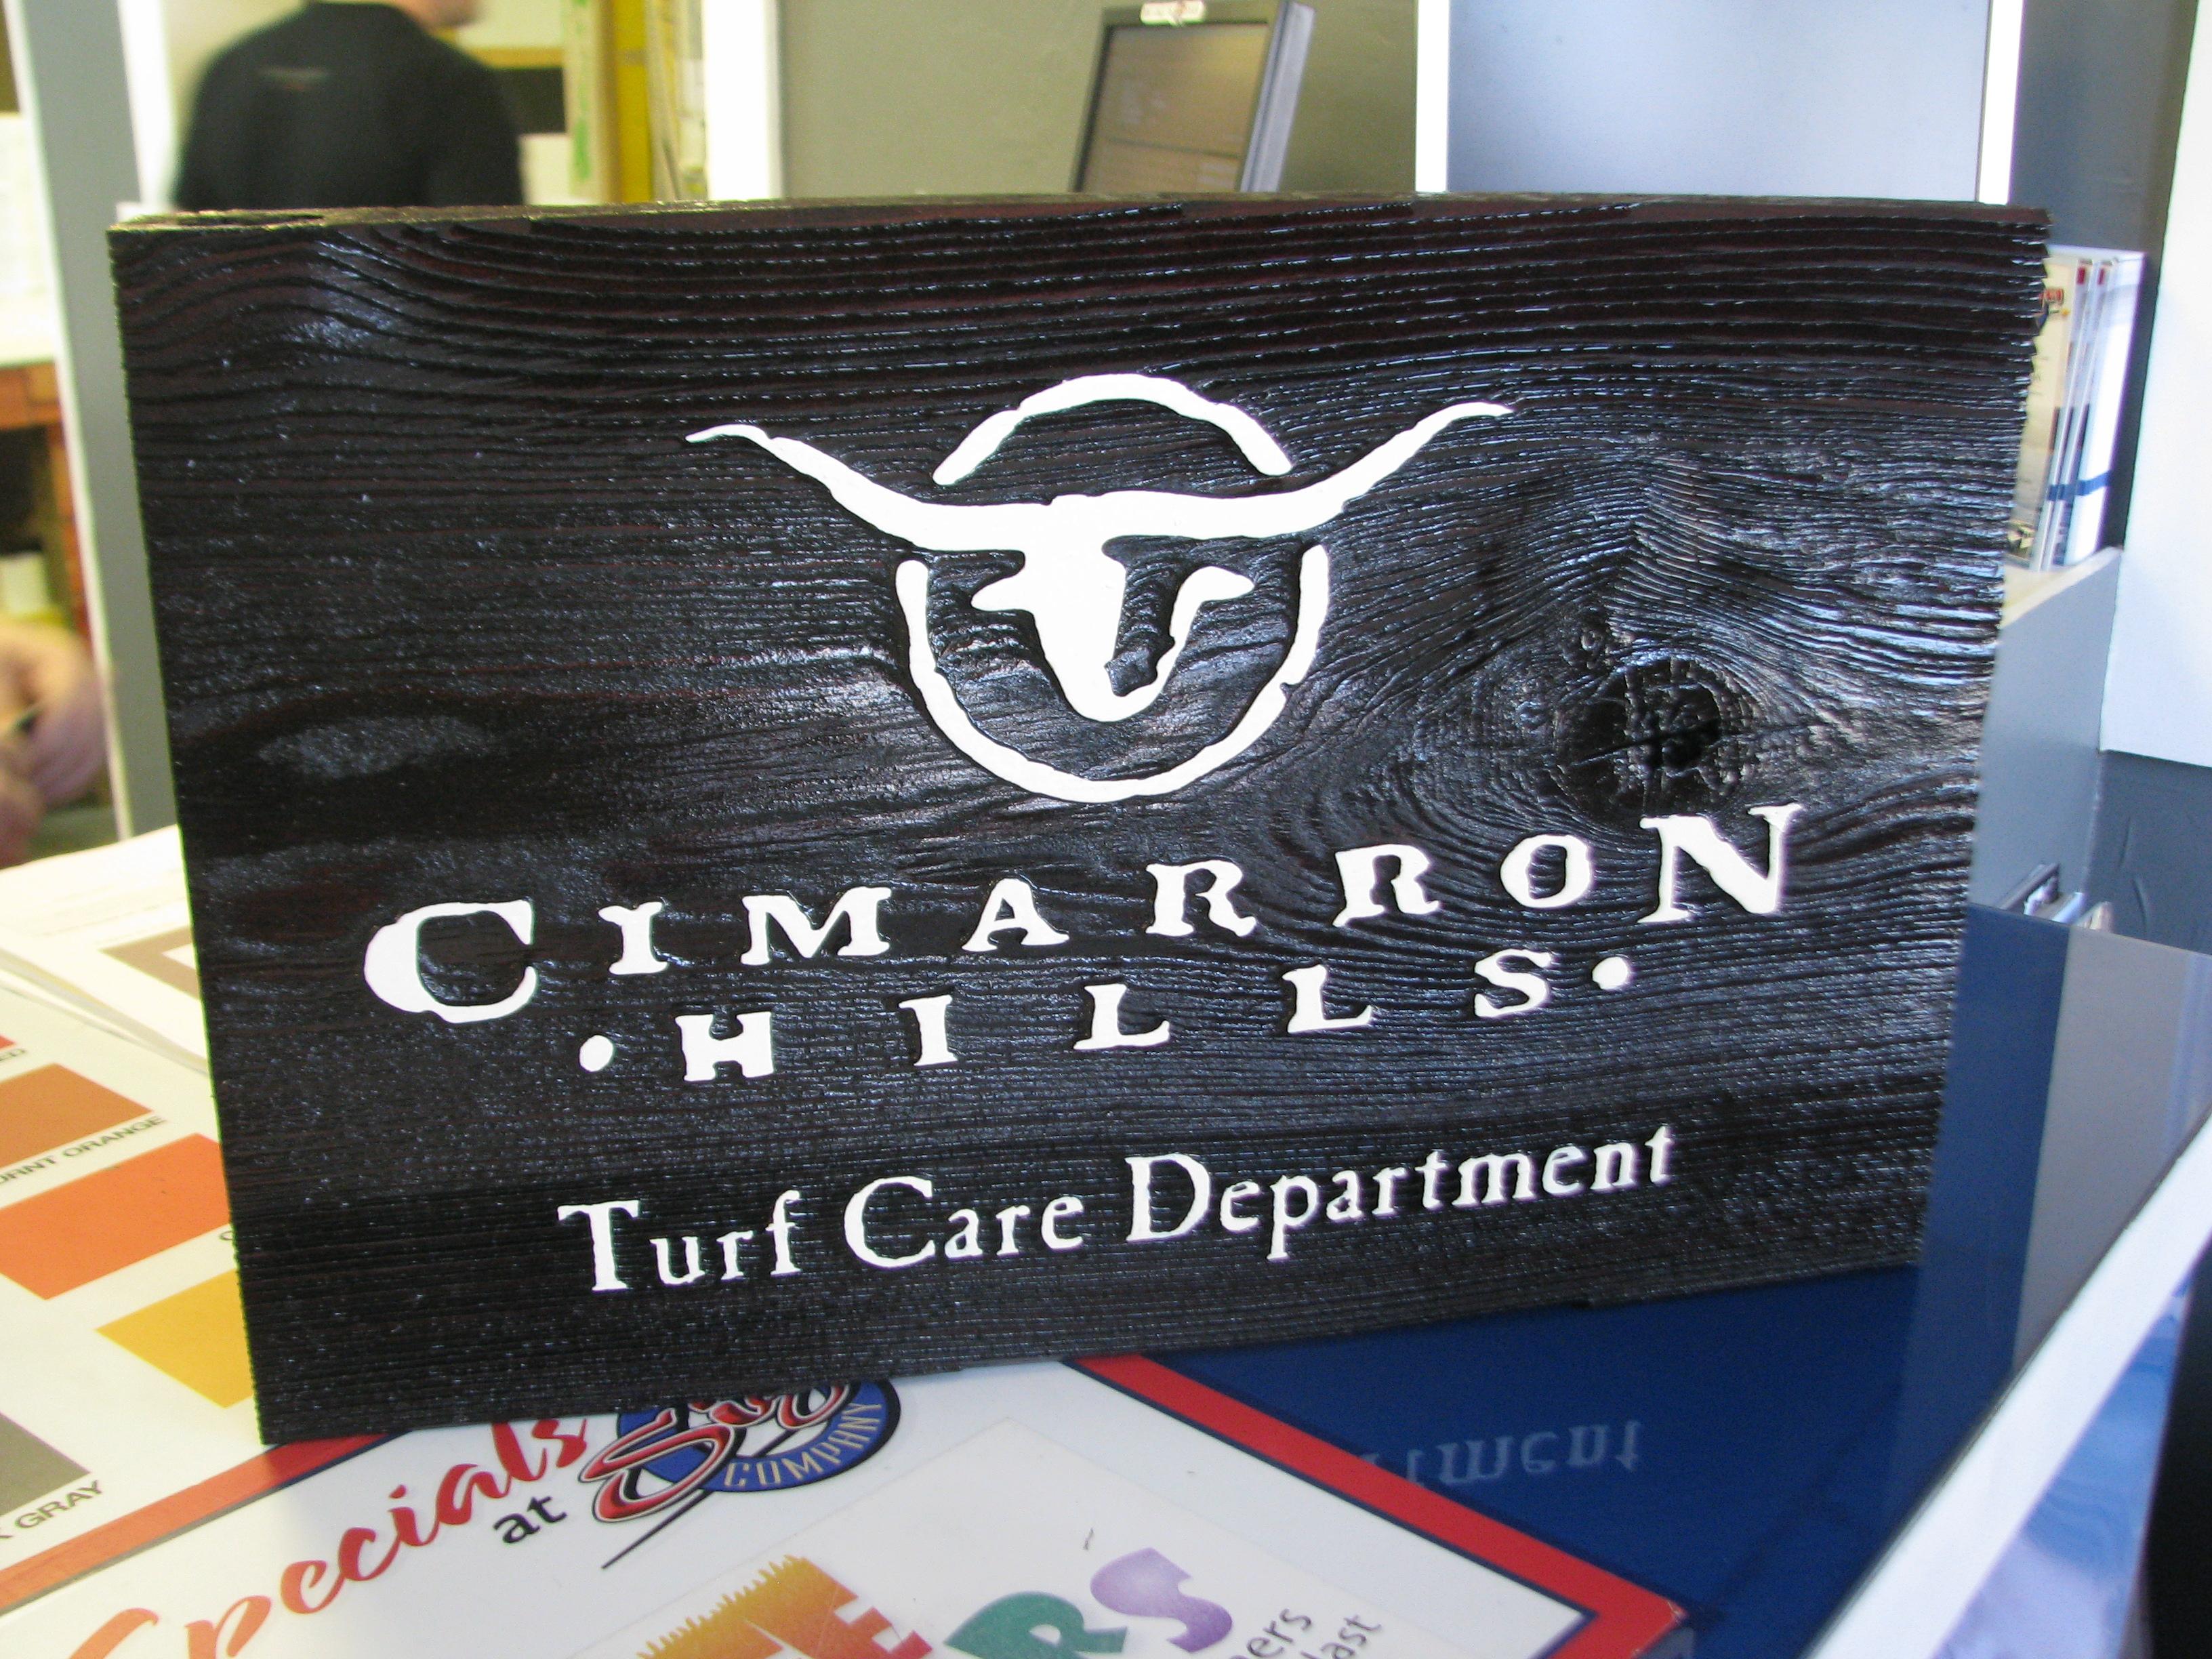 Cimarron Hills - lk31941 - 1.JPG